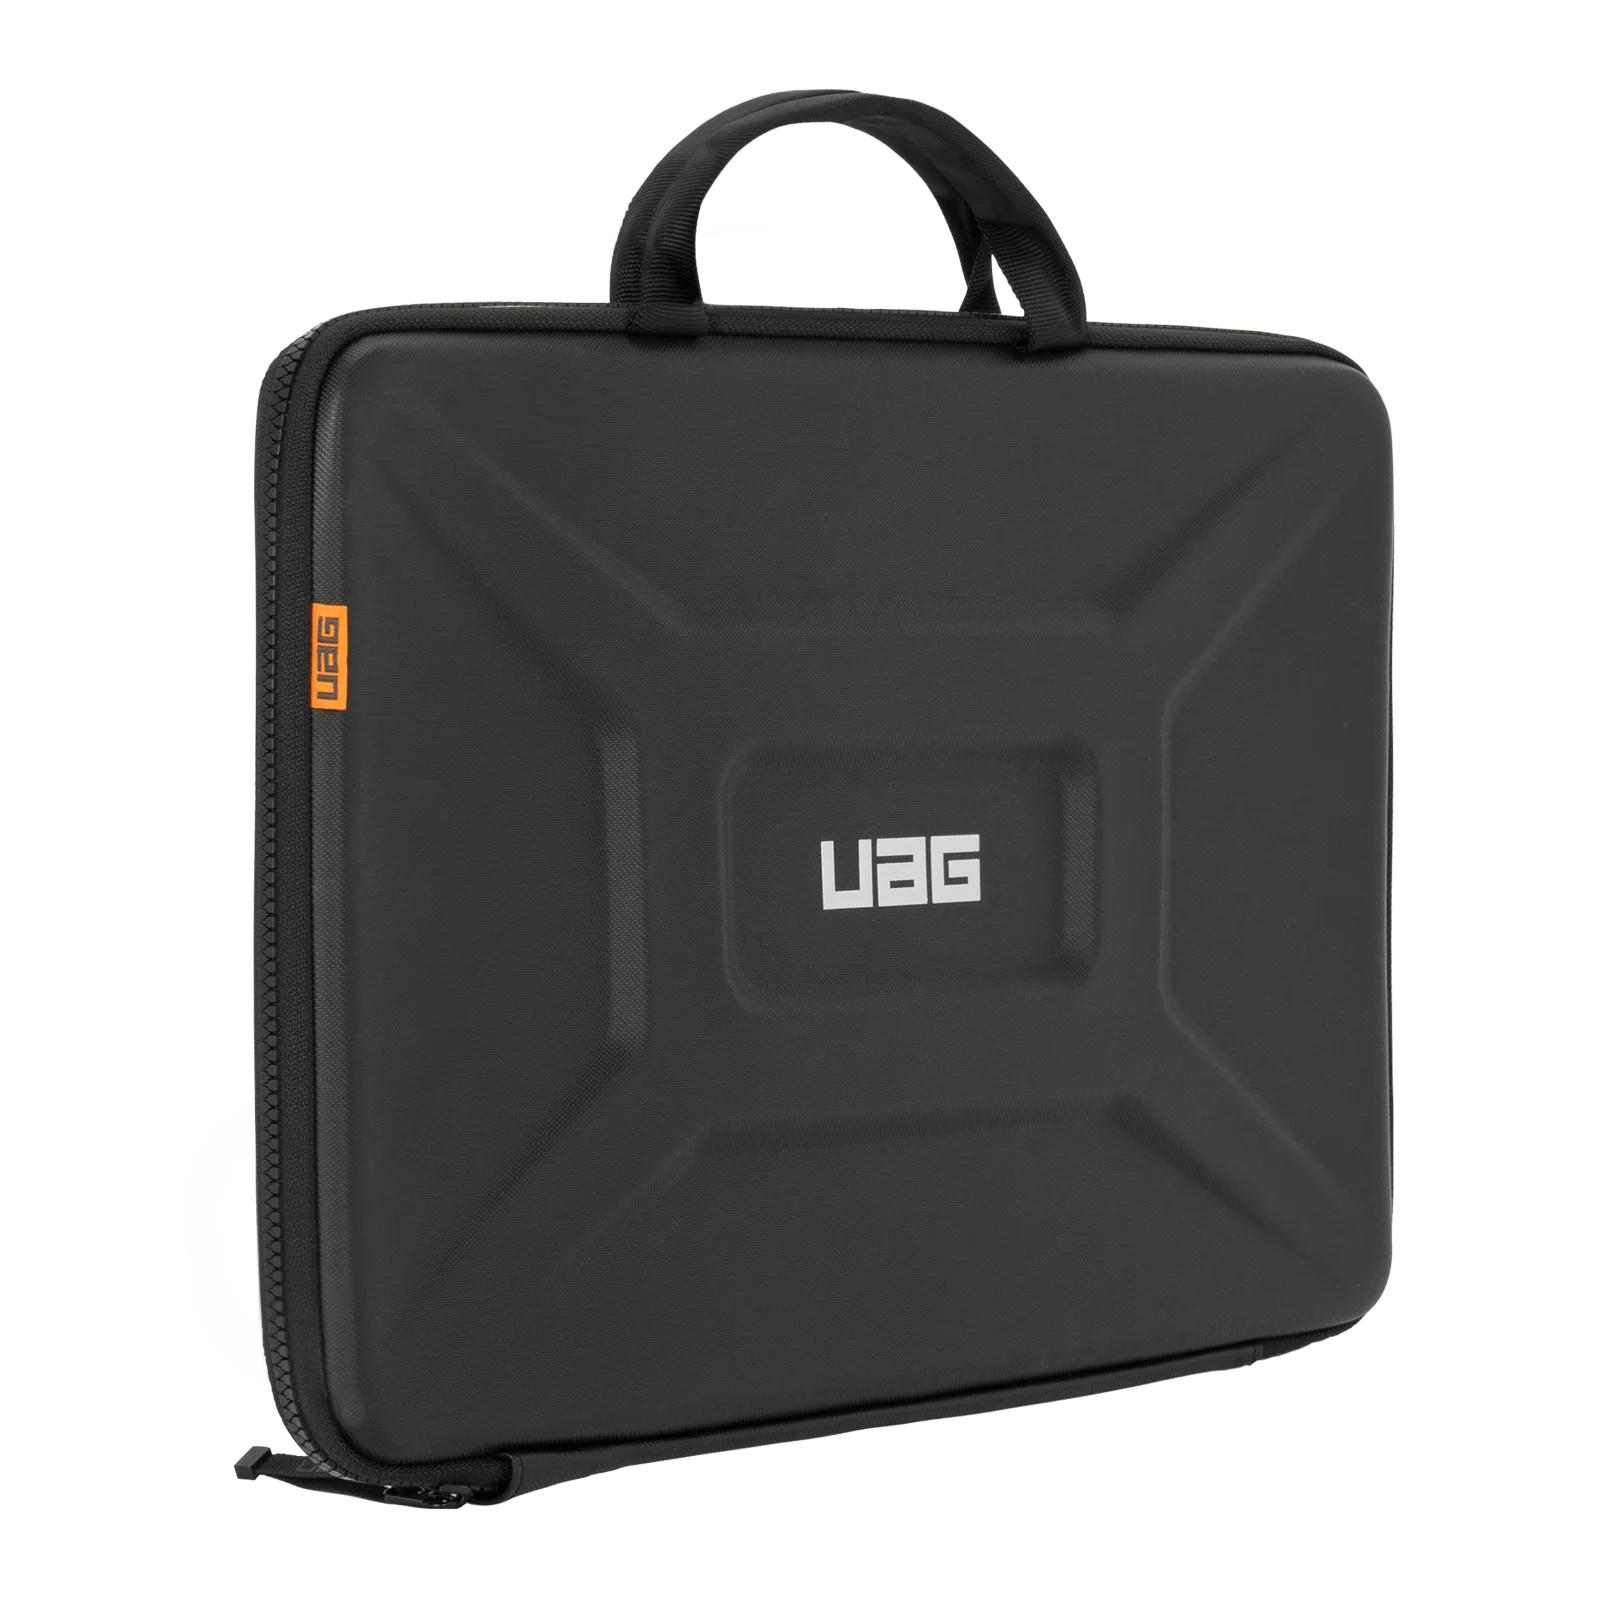 "Urban Armor Gear 982010114040 maletines para portátil 38,1 cm (15"") Funda Negro"